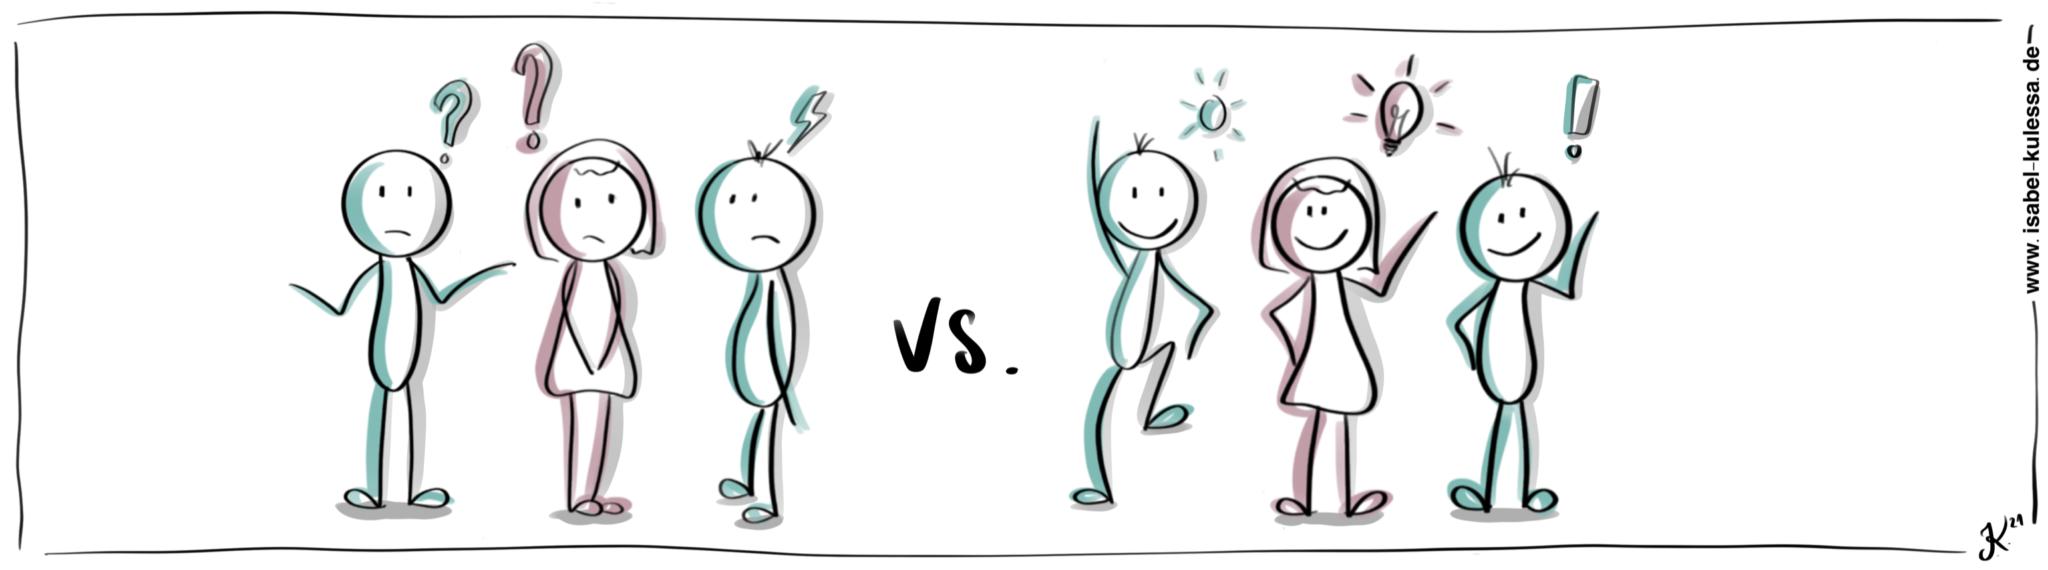 Positive Sprache verändert Kommunikation